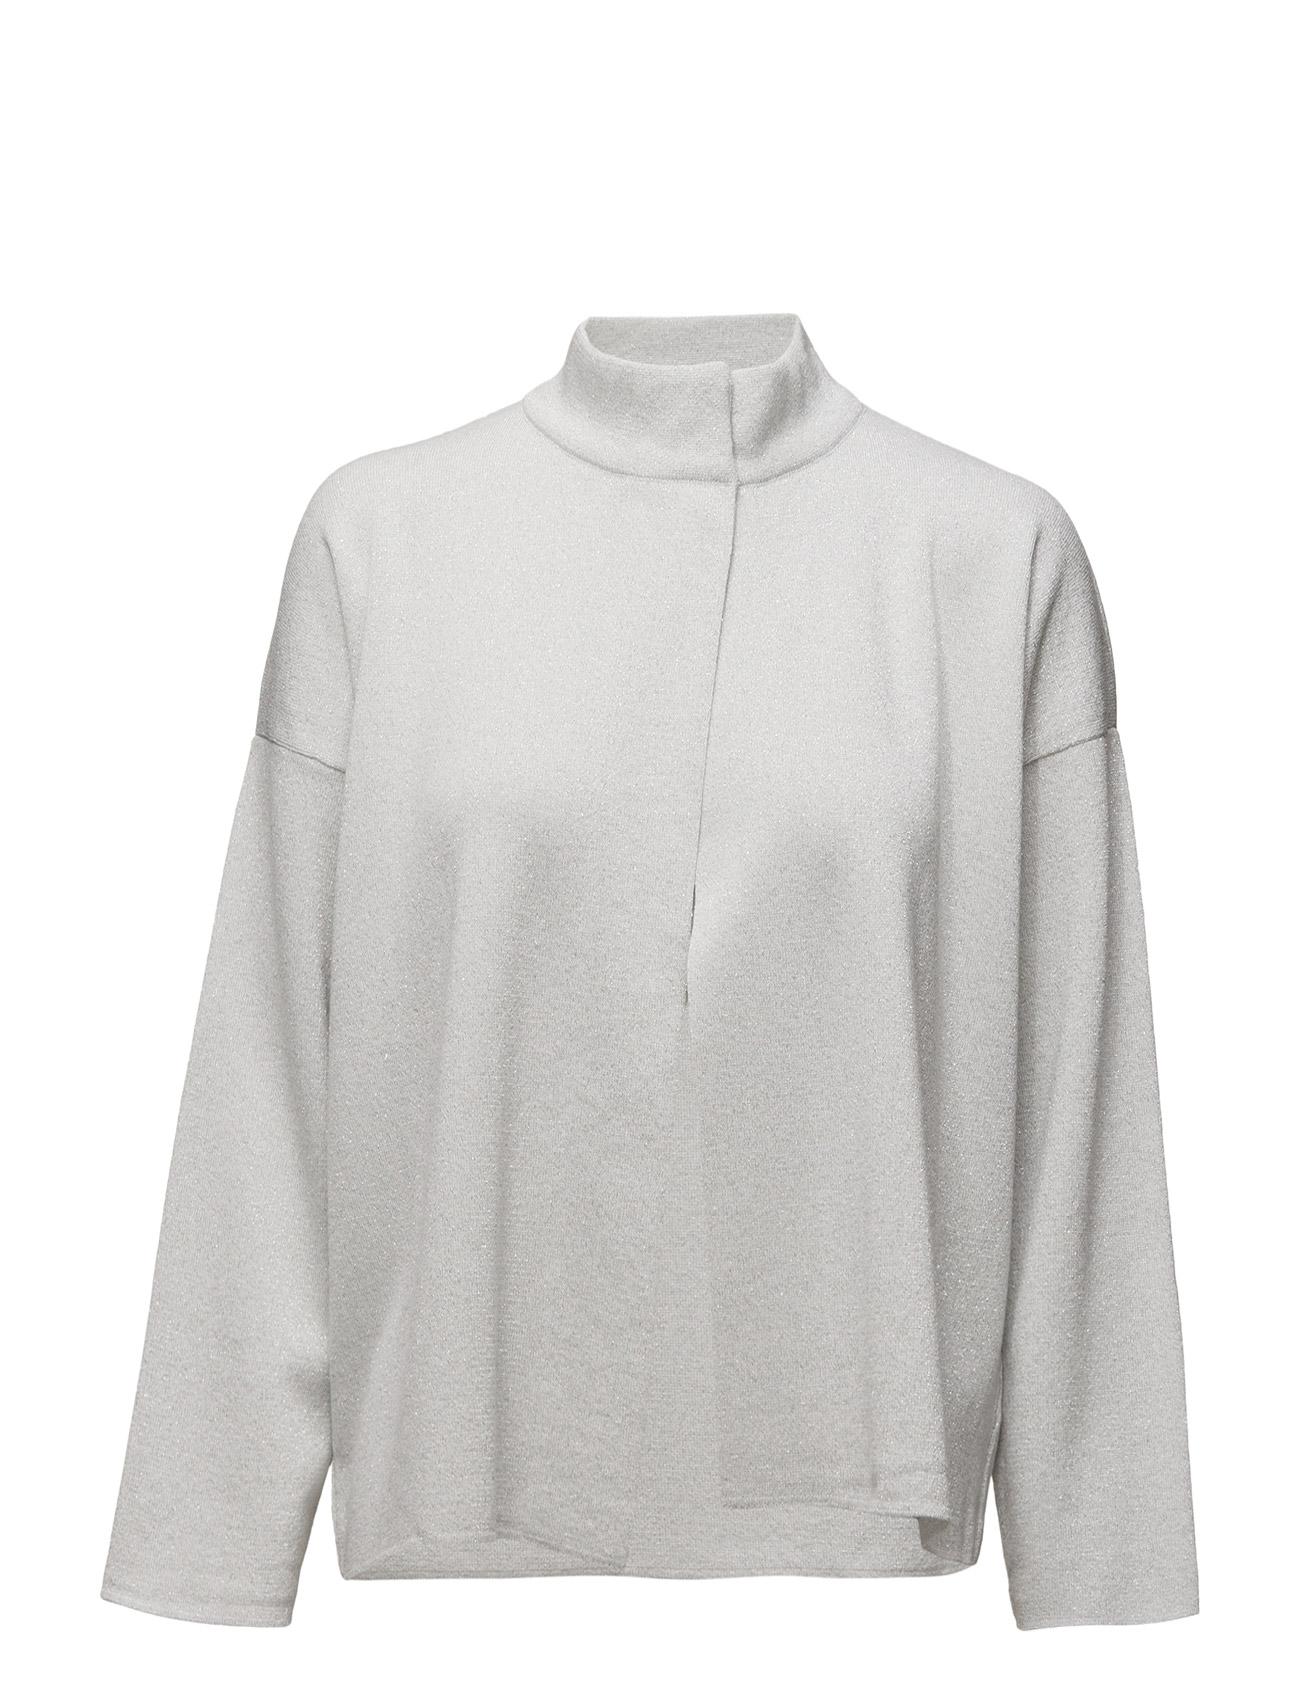 Metallic Thread Jacket Mango Cardigans til Kvinder i Sølv